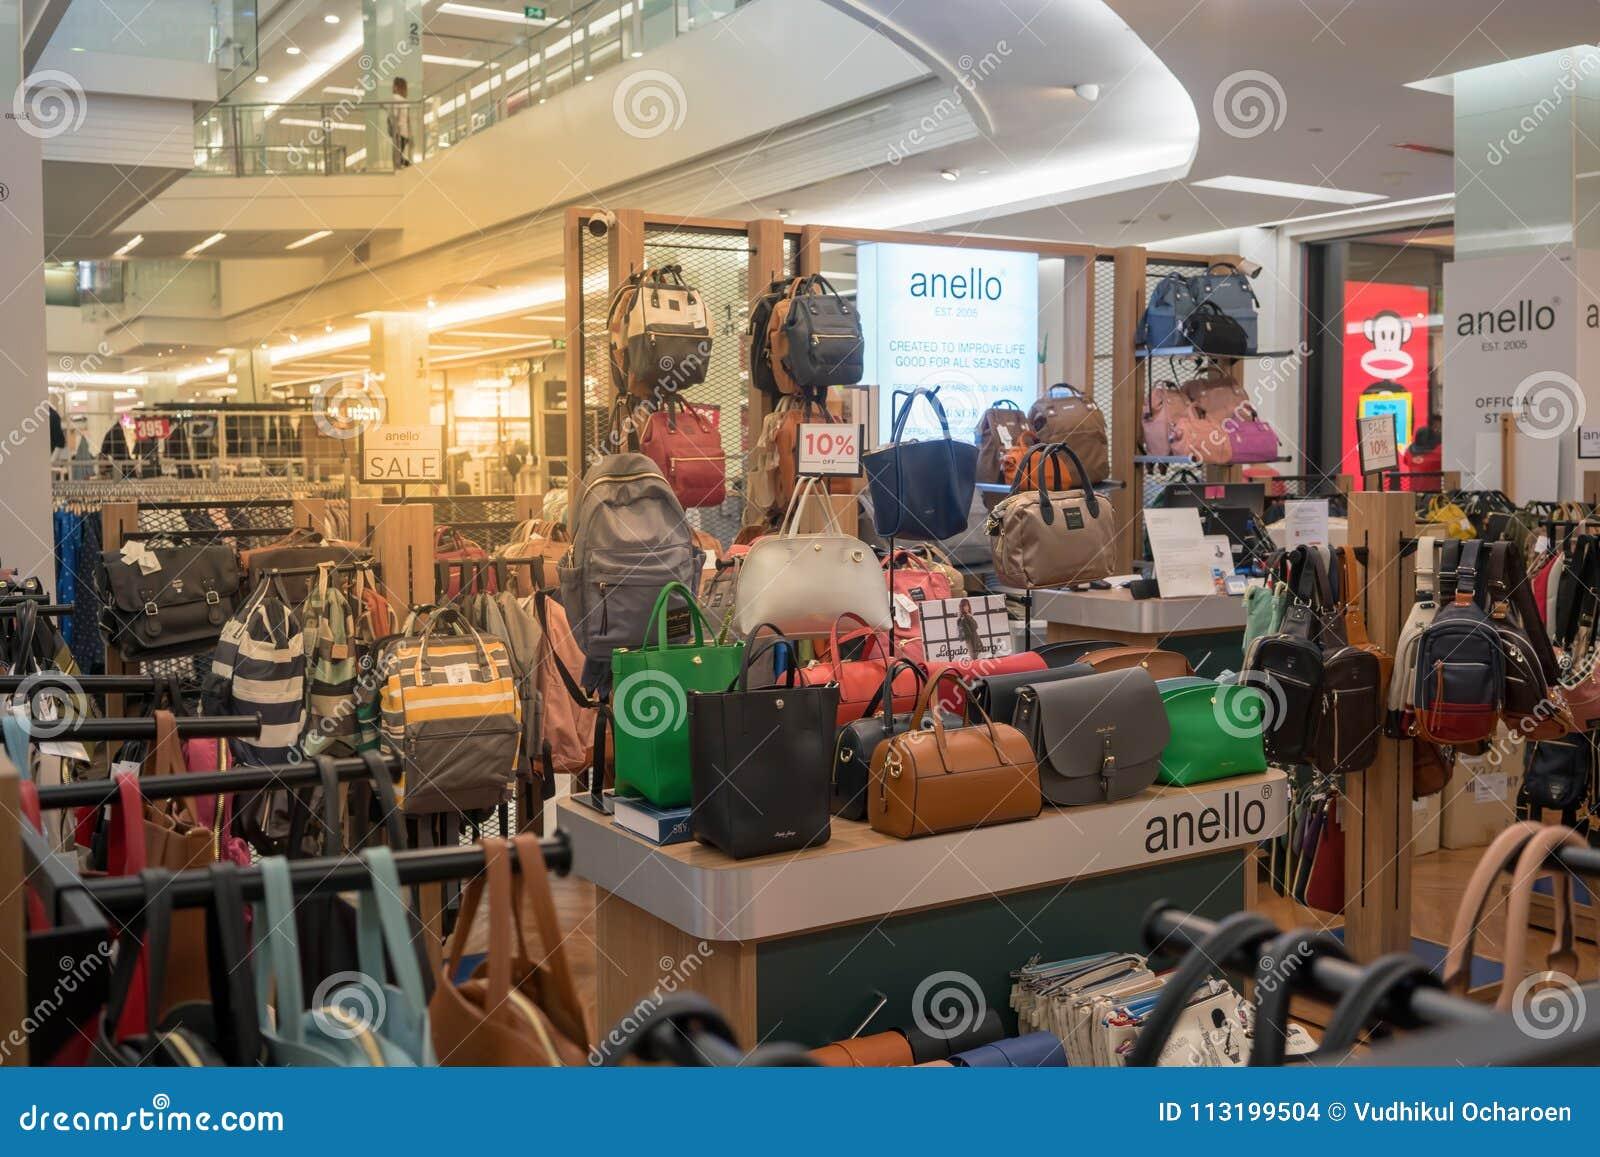 Anello Shop At Fashion Island c0594dd55cf8d